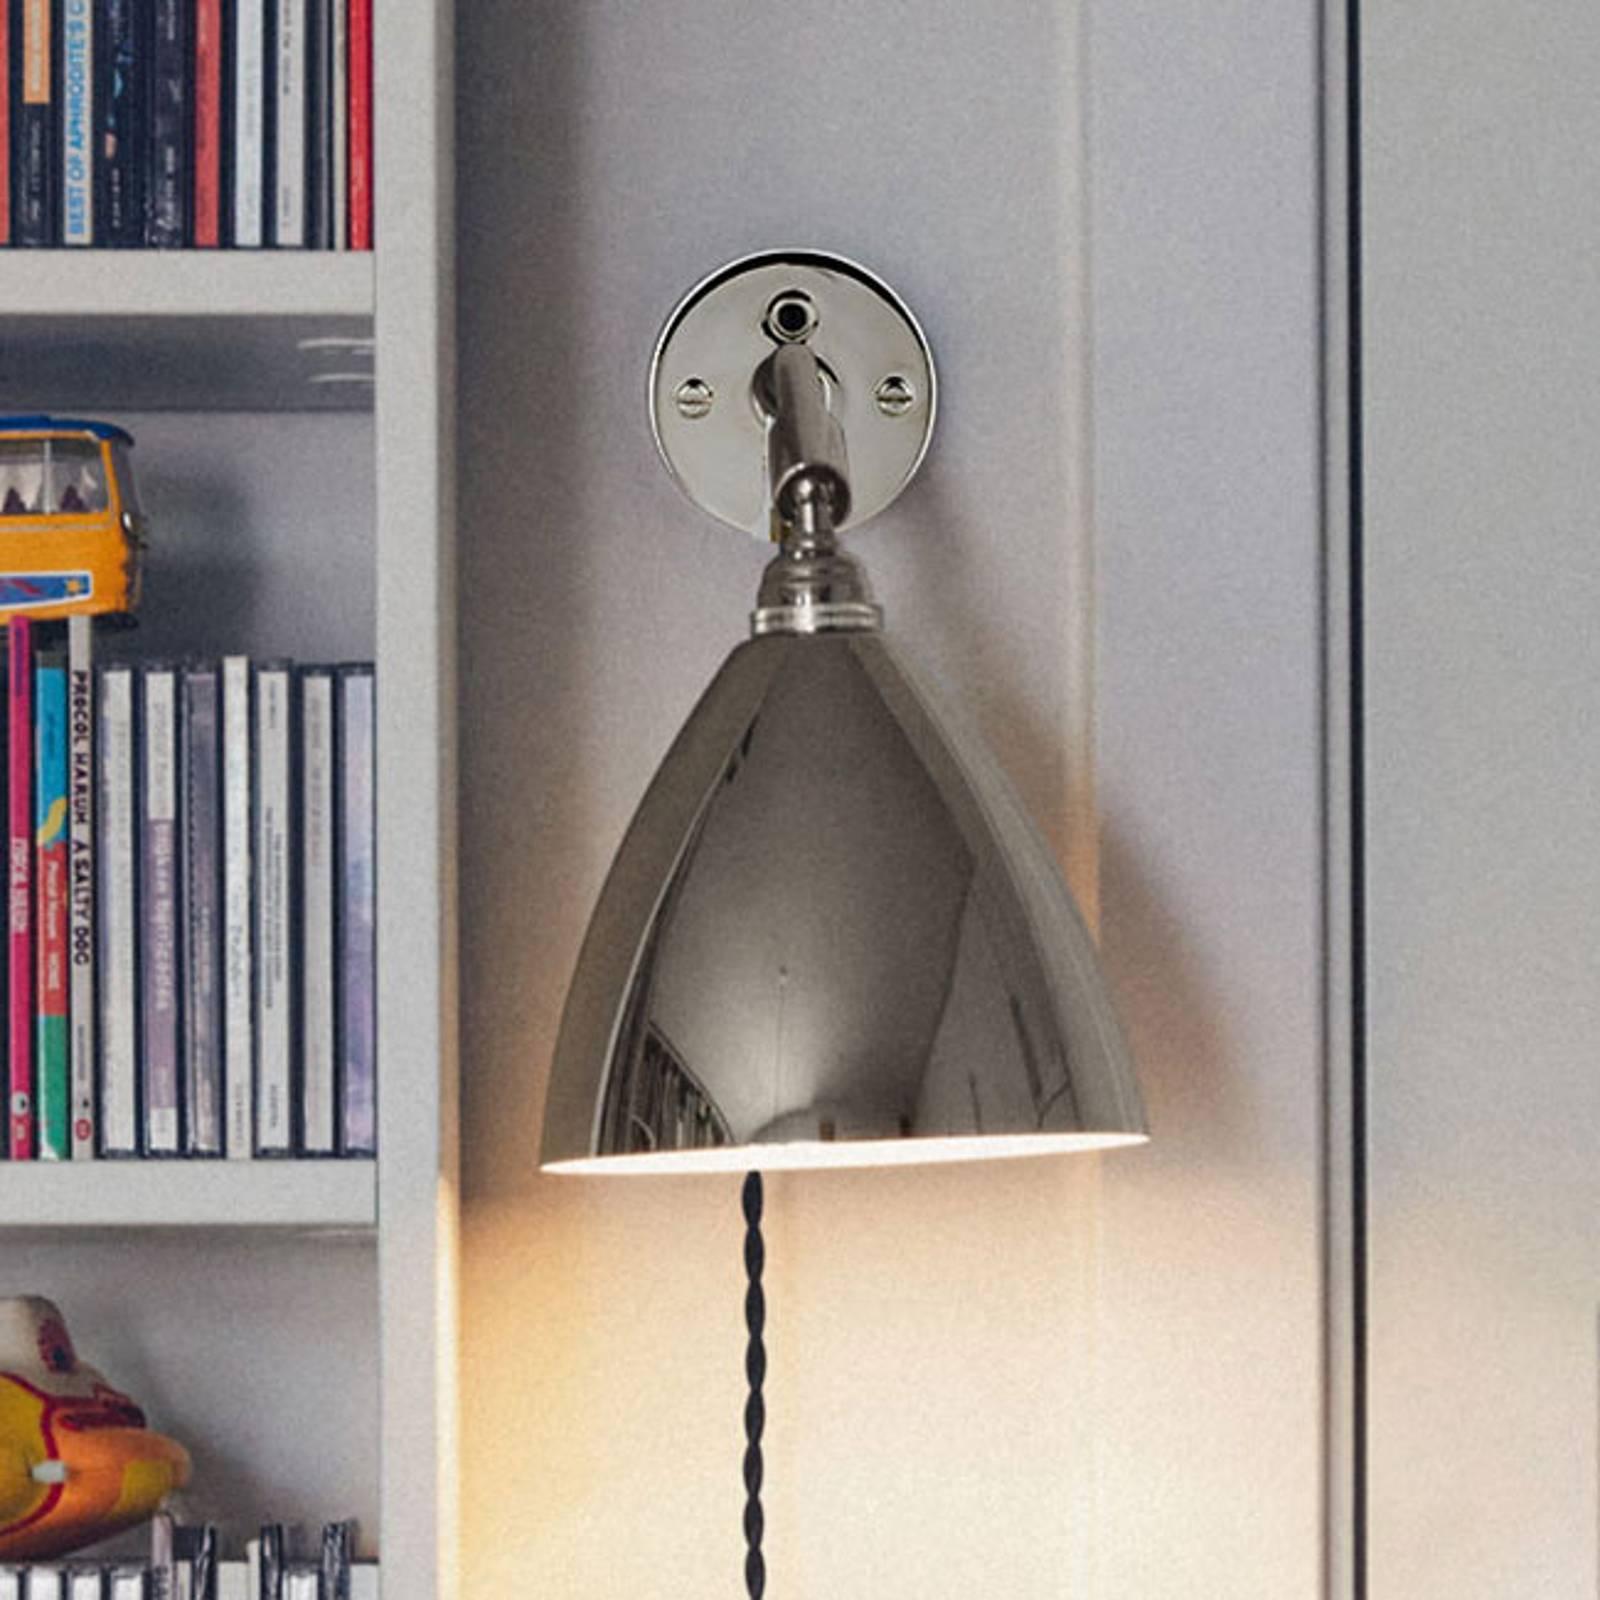 GUBI Bestlite BL7 wandlamp, gelimiteerd, nikkel